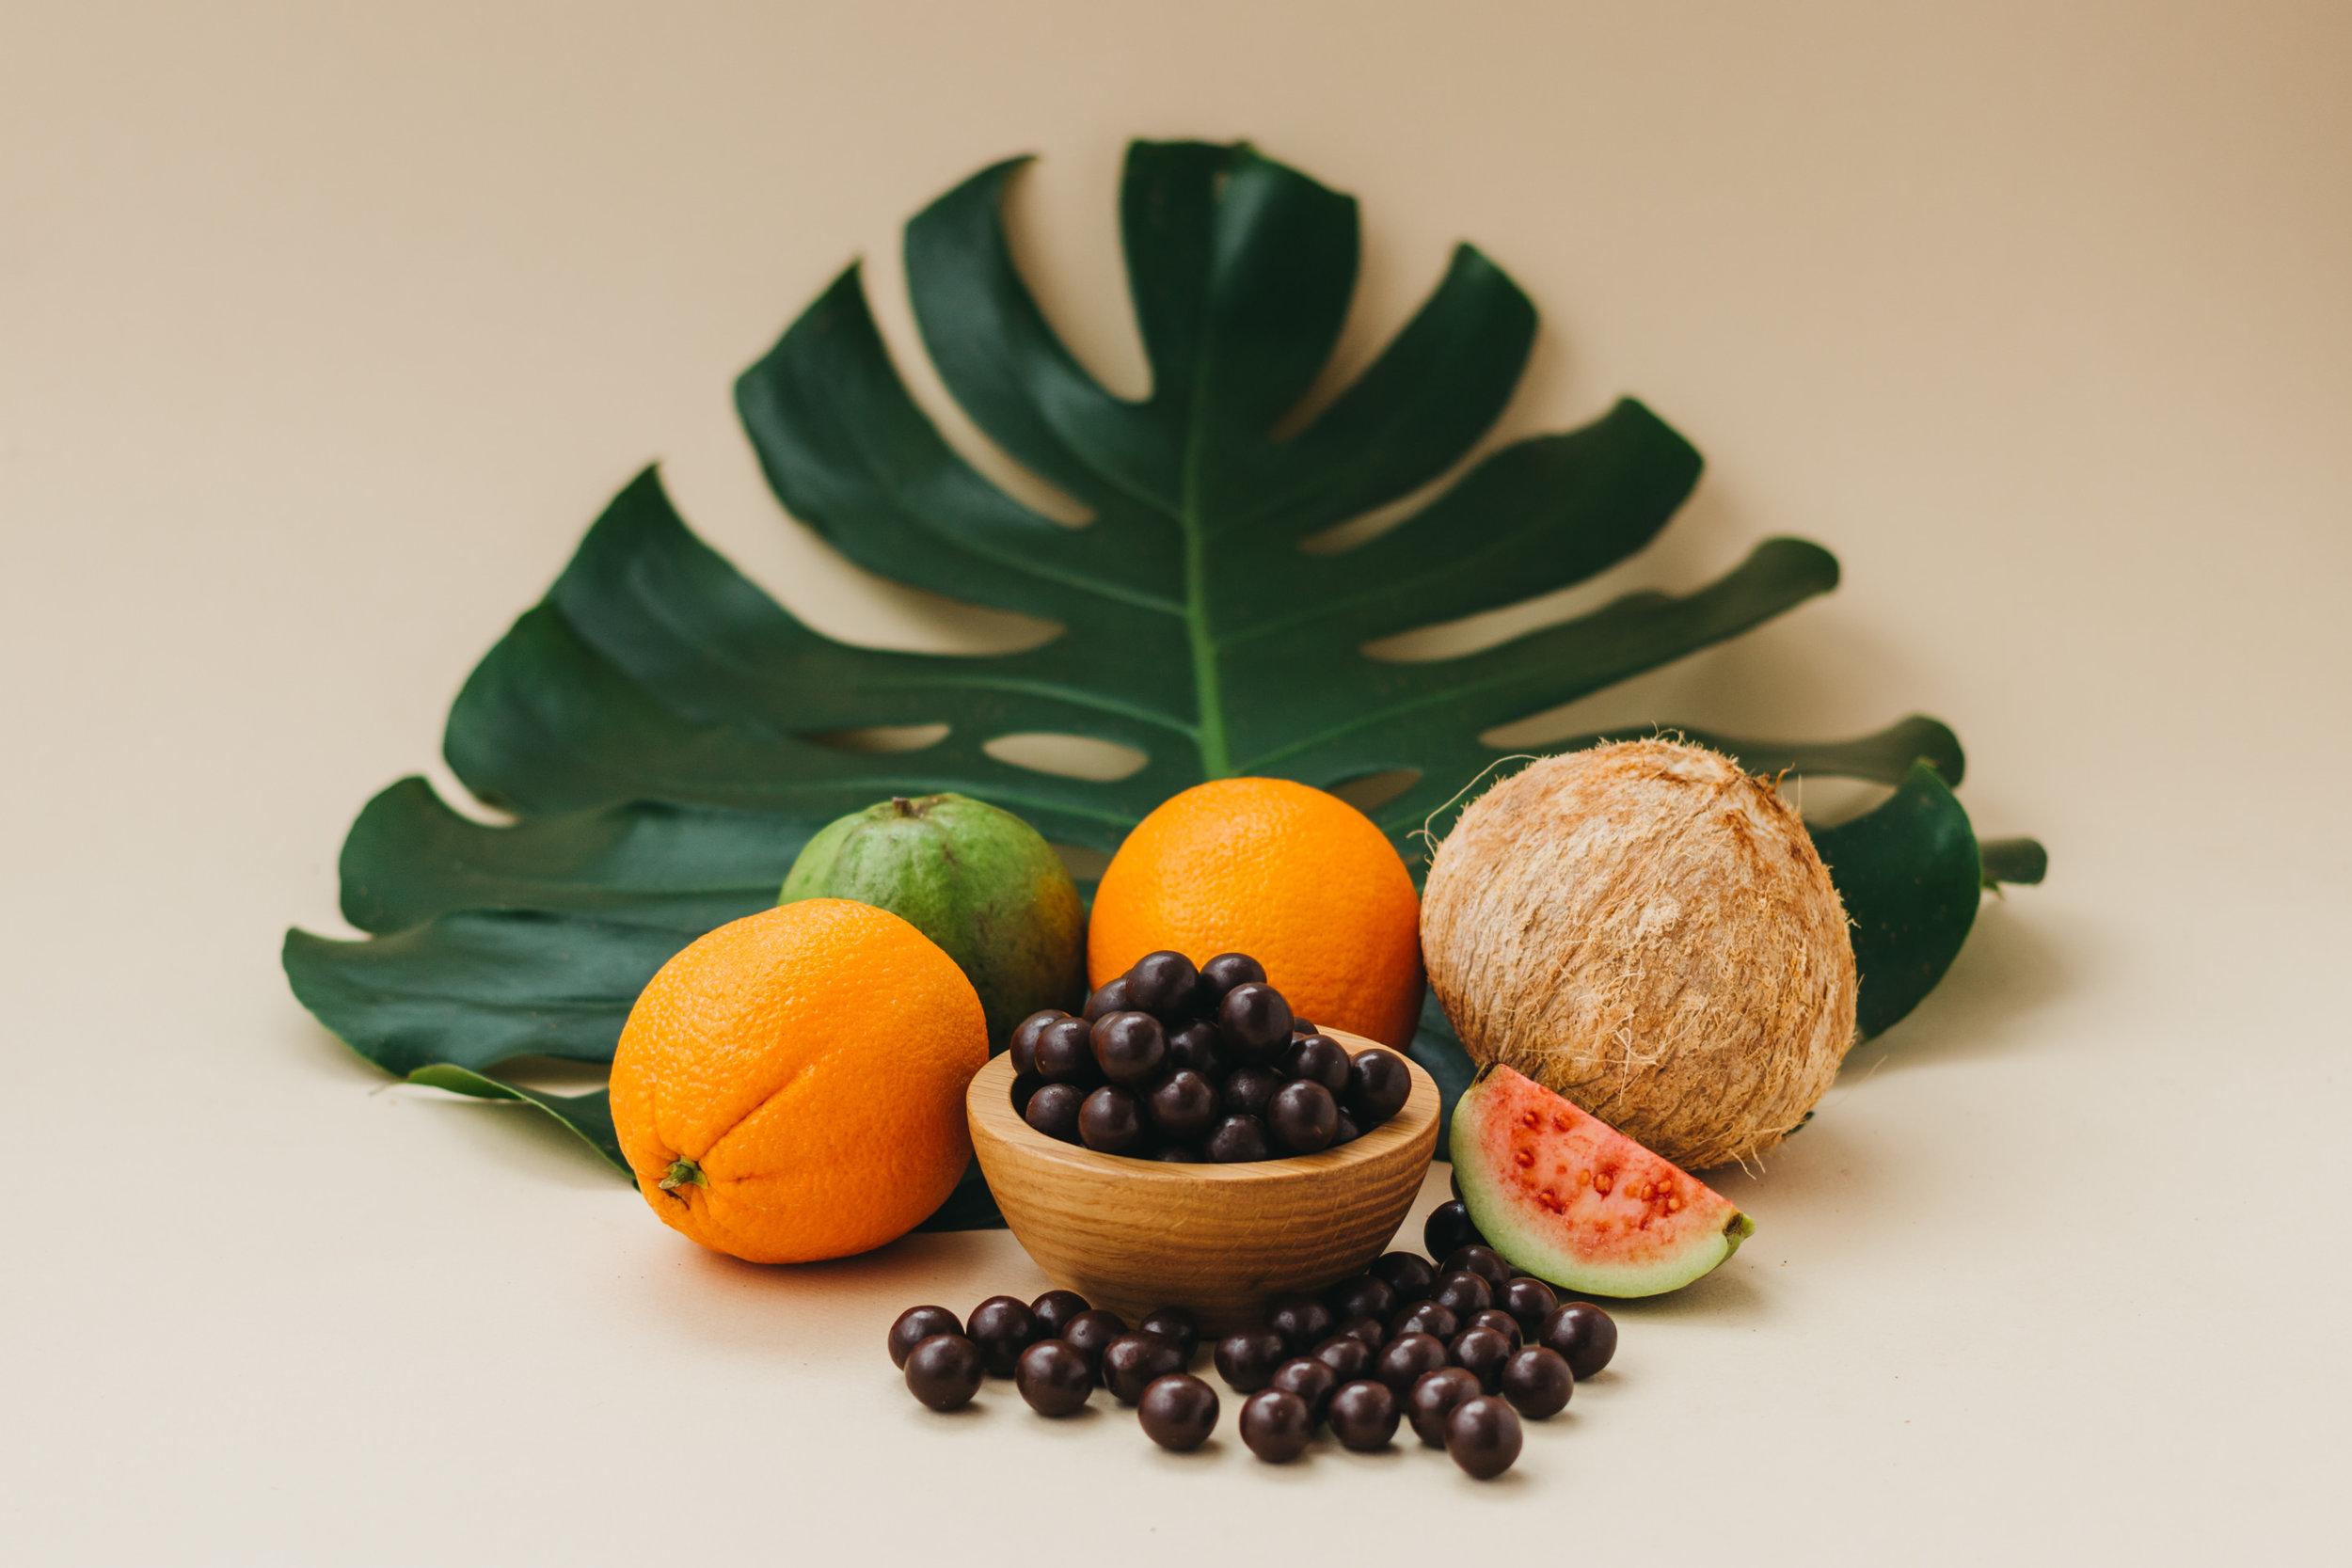 Chocolates and fruits